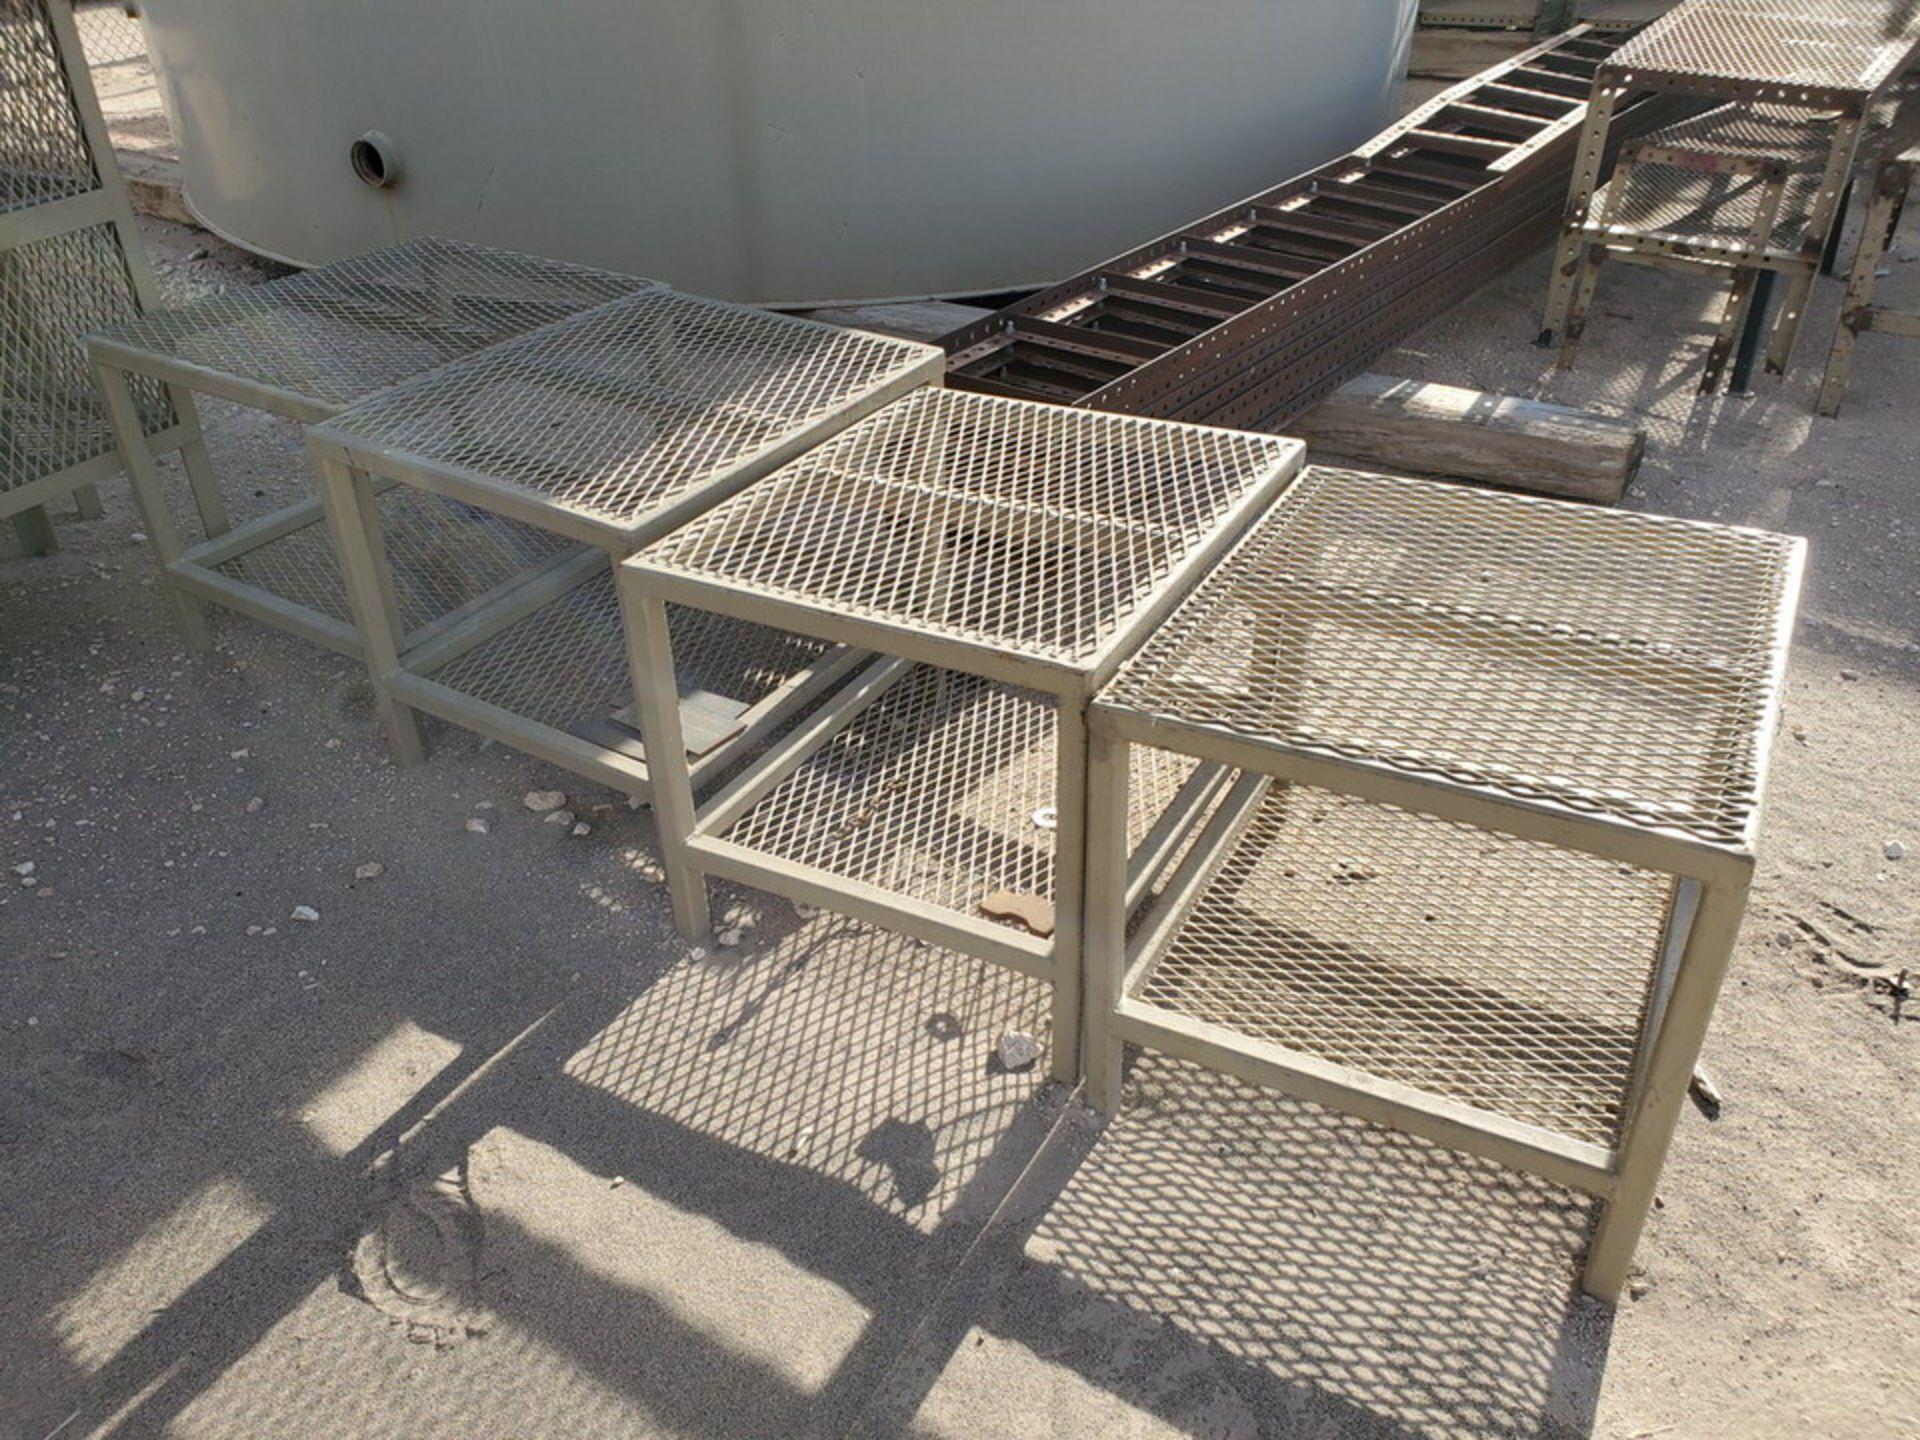 "Assorted Stl Matl. Racks & Ladders Size Range: 30"" x 26"" x 25""H - 29"" x 48"" x 50""H - Image 7 of 18"